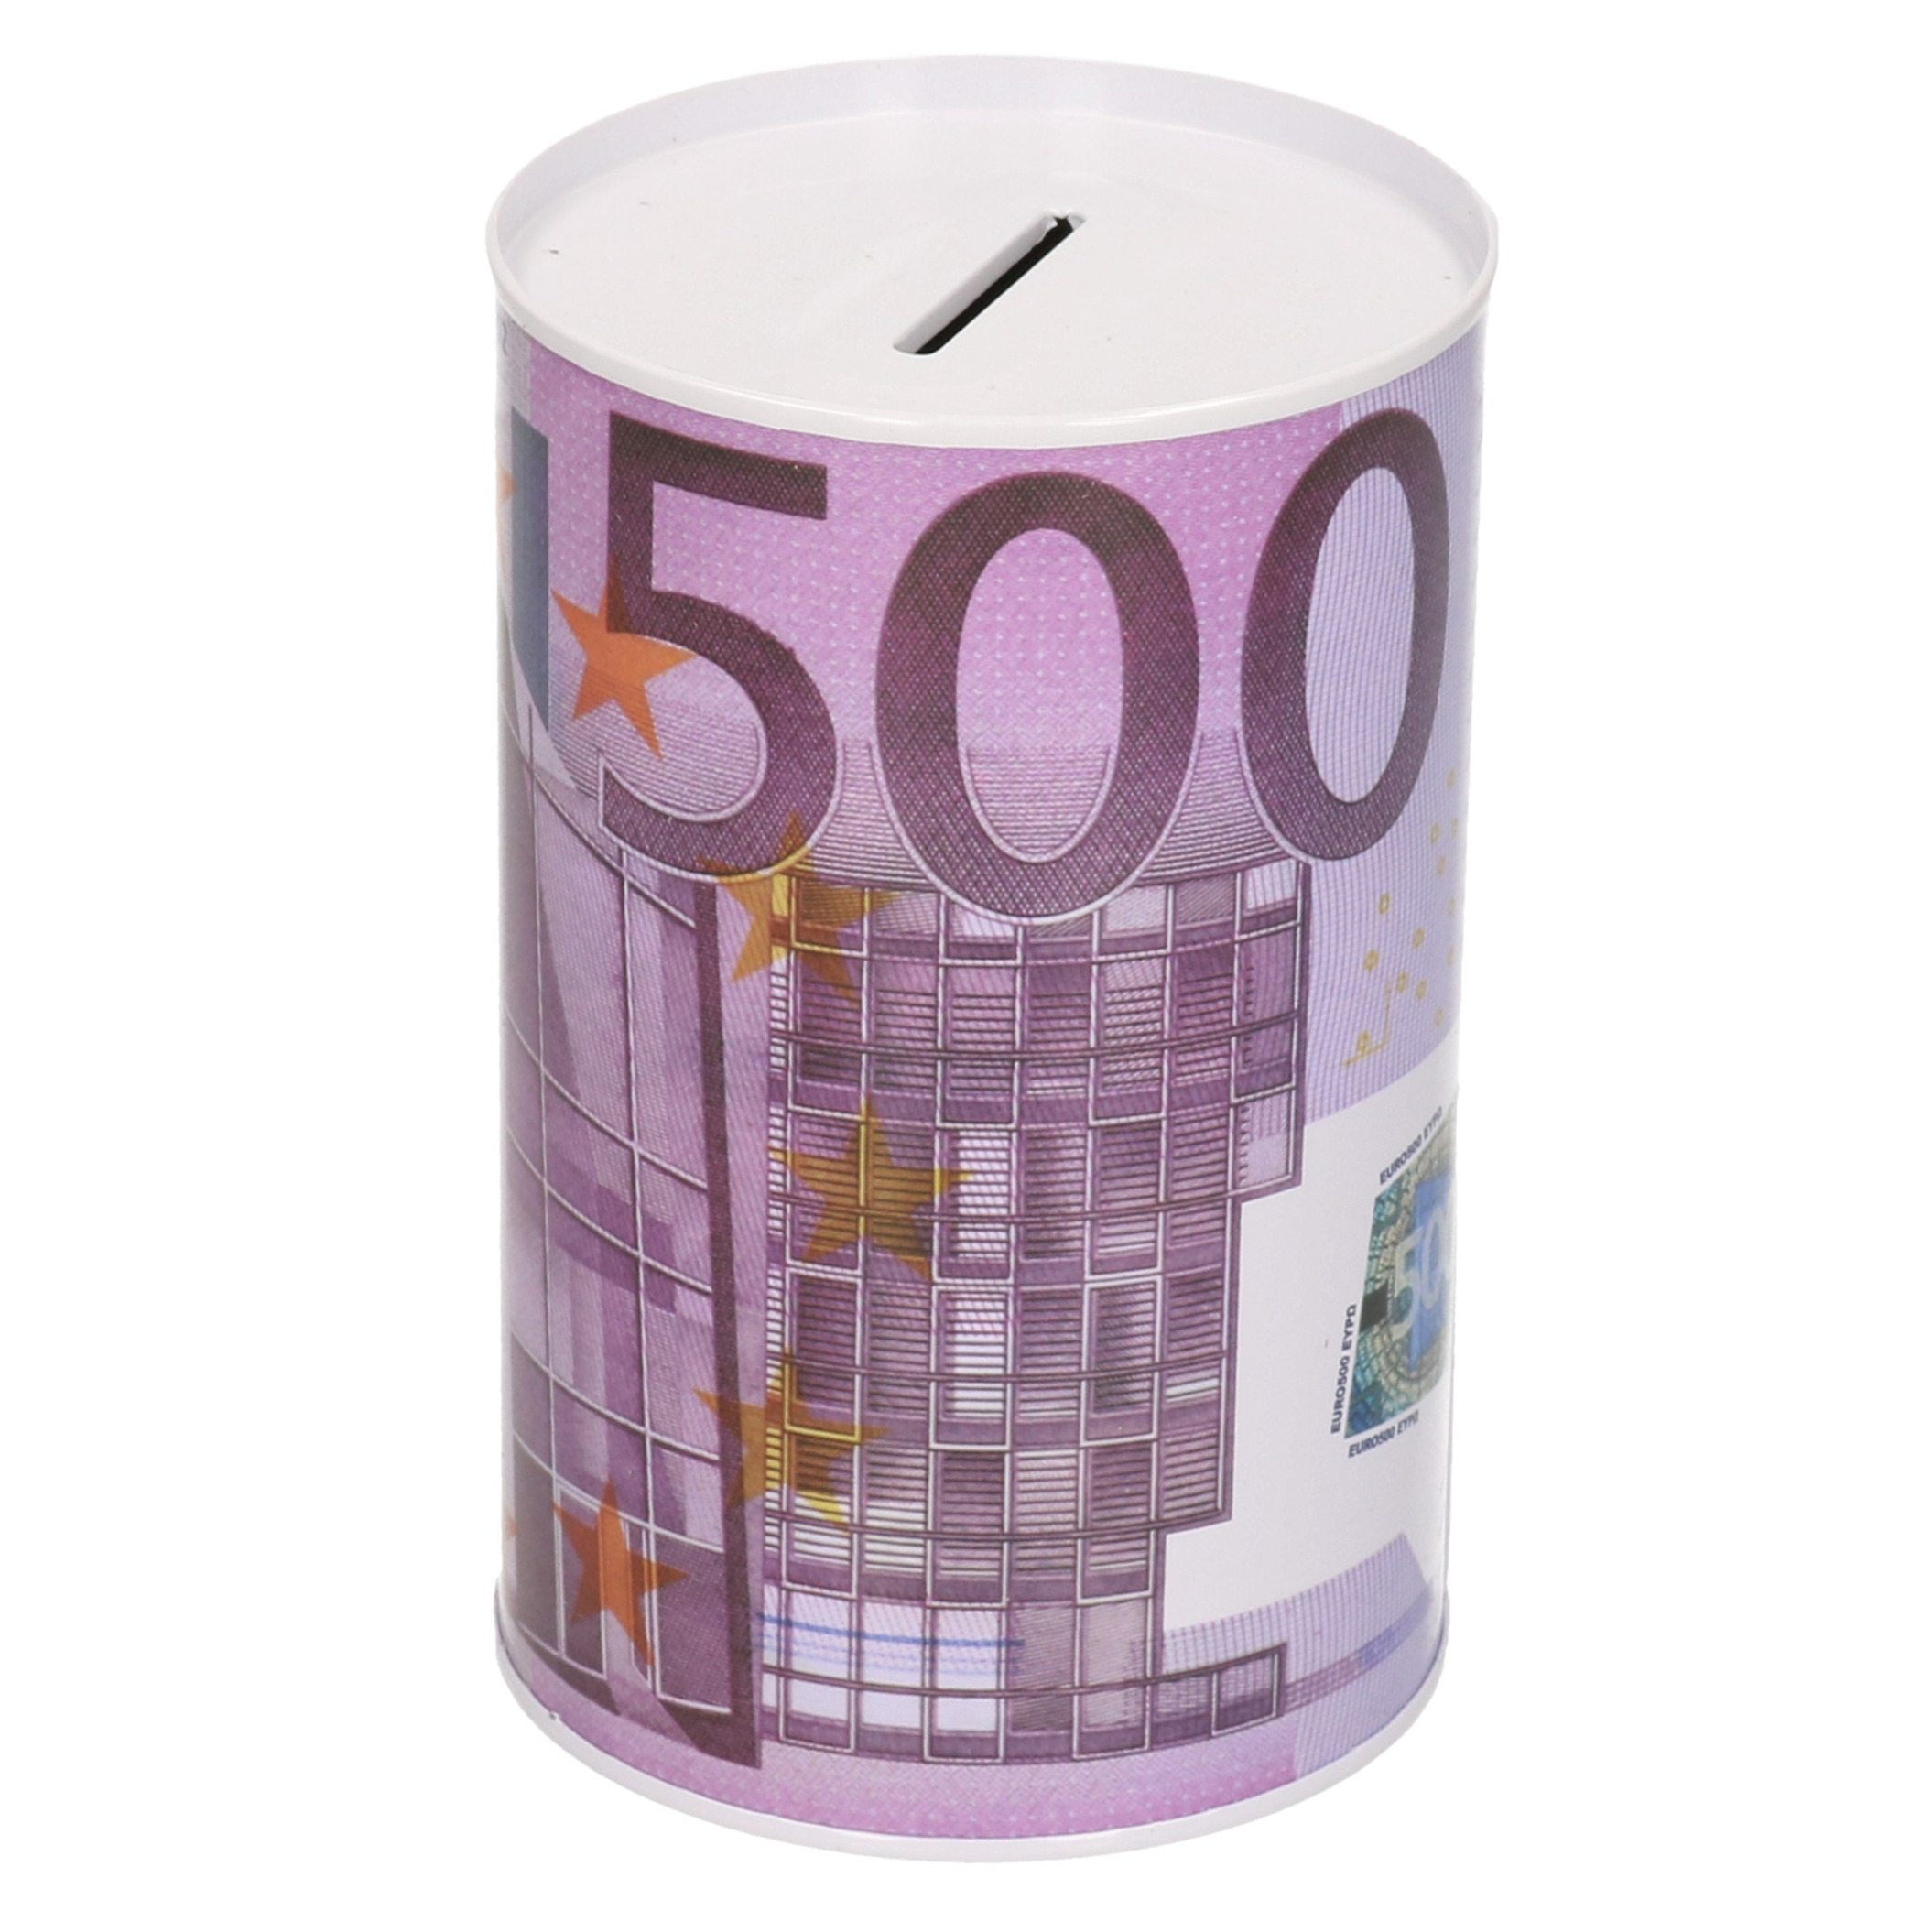 Spaarpot blik 500 euro biljet 8 x 15 cm